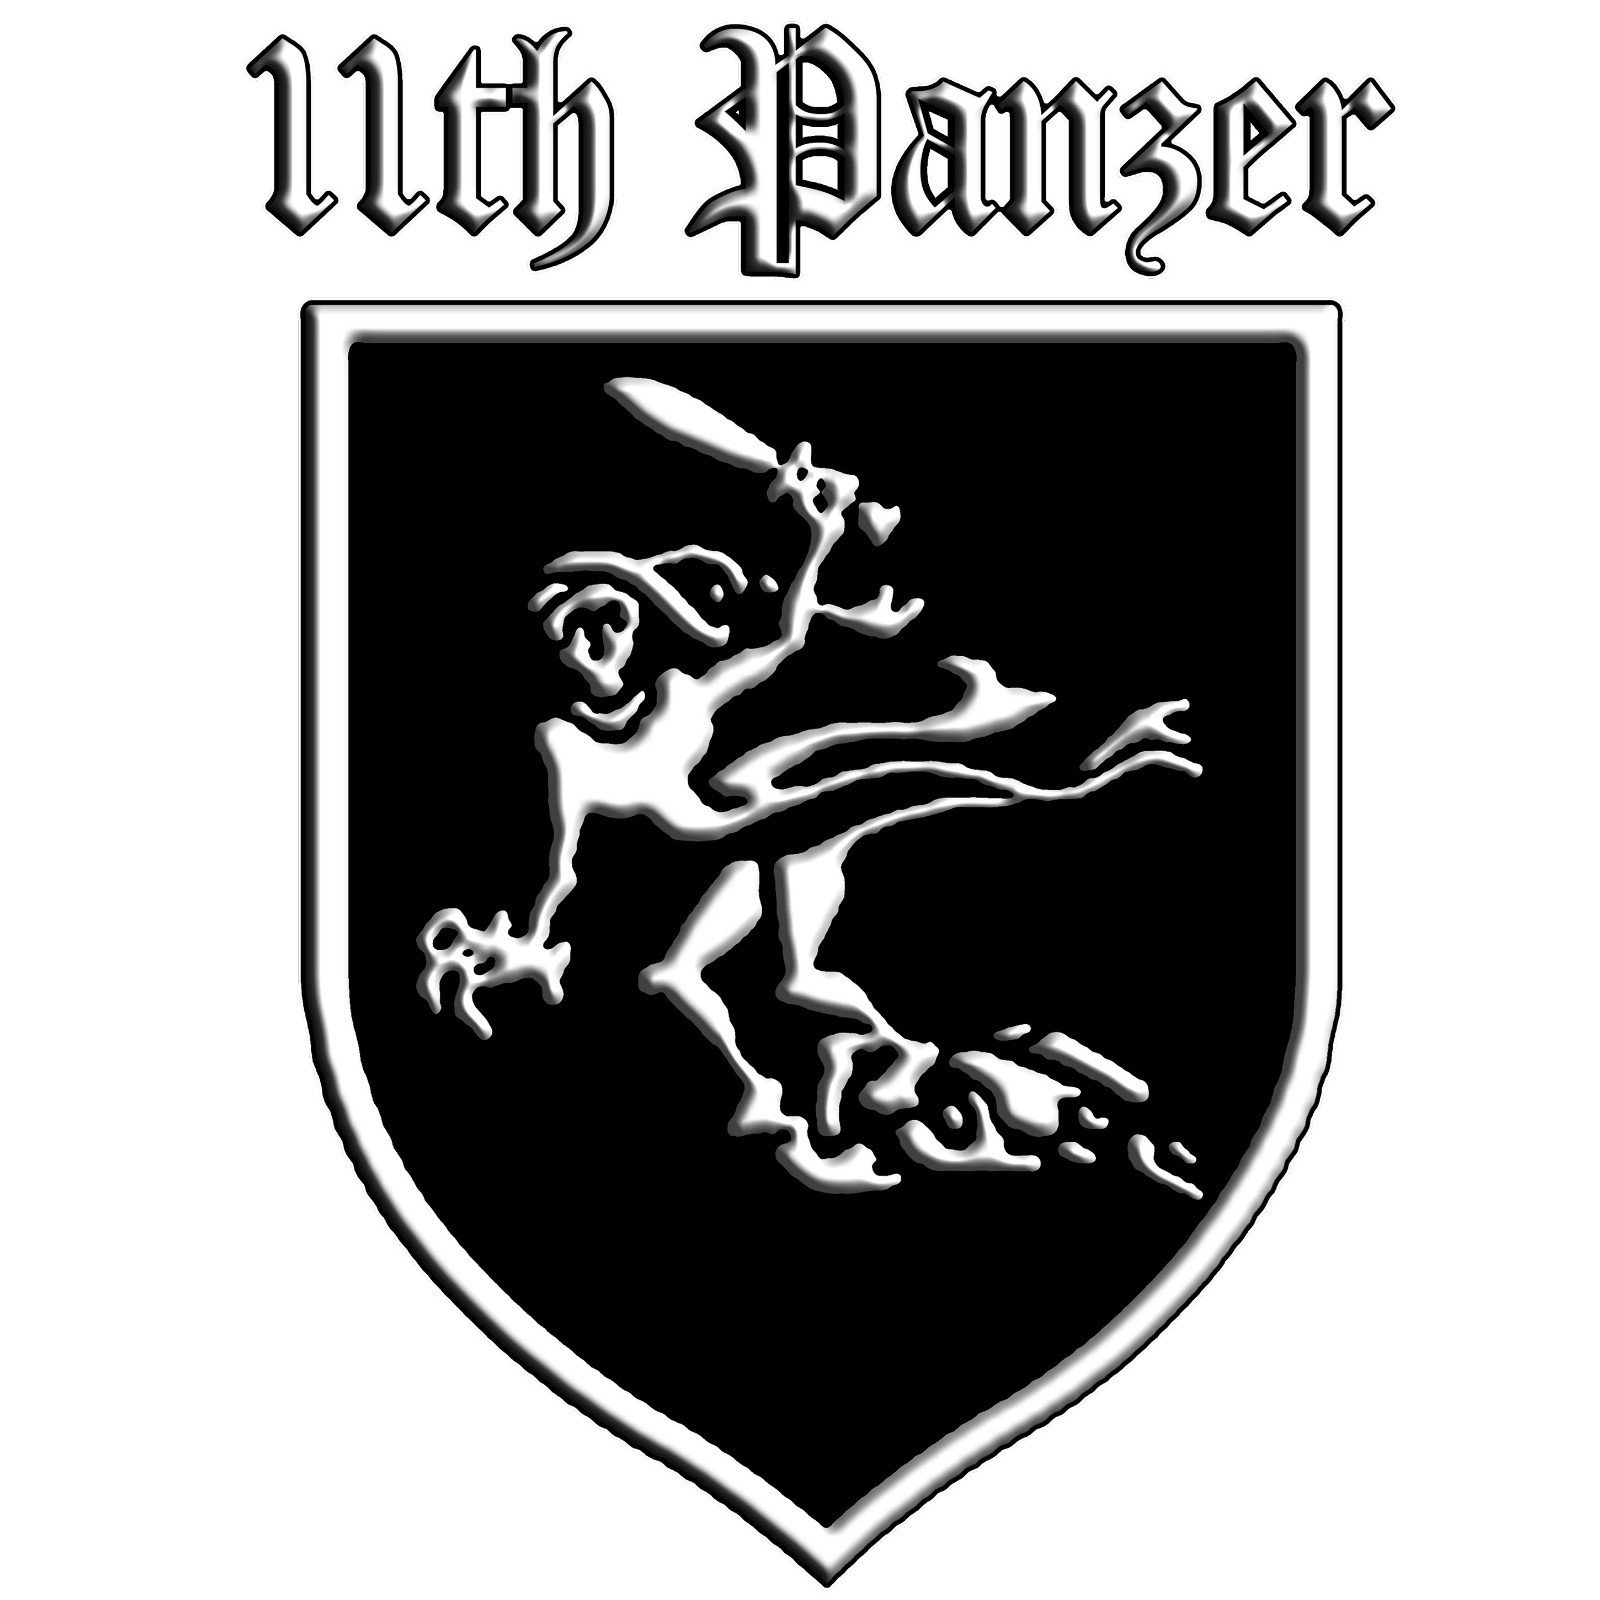 Galleon 11th panzer division ghost zusatzsymbol ww2 tiger tank german army vinyl decal by achtung t shirt llc